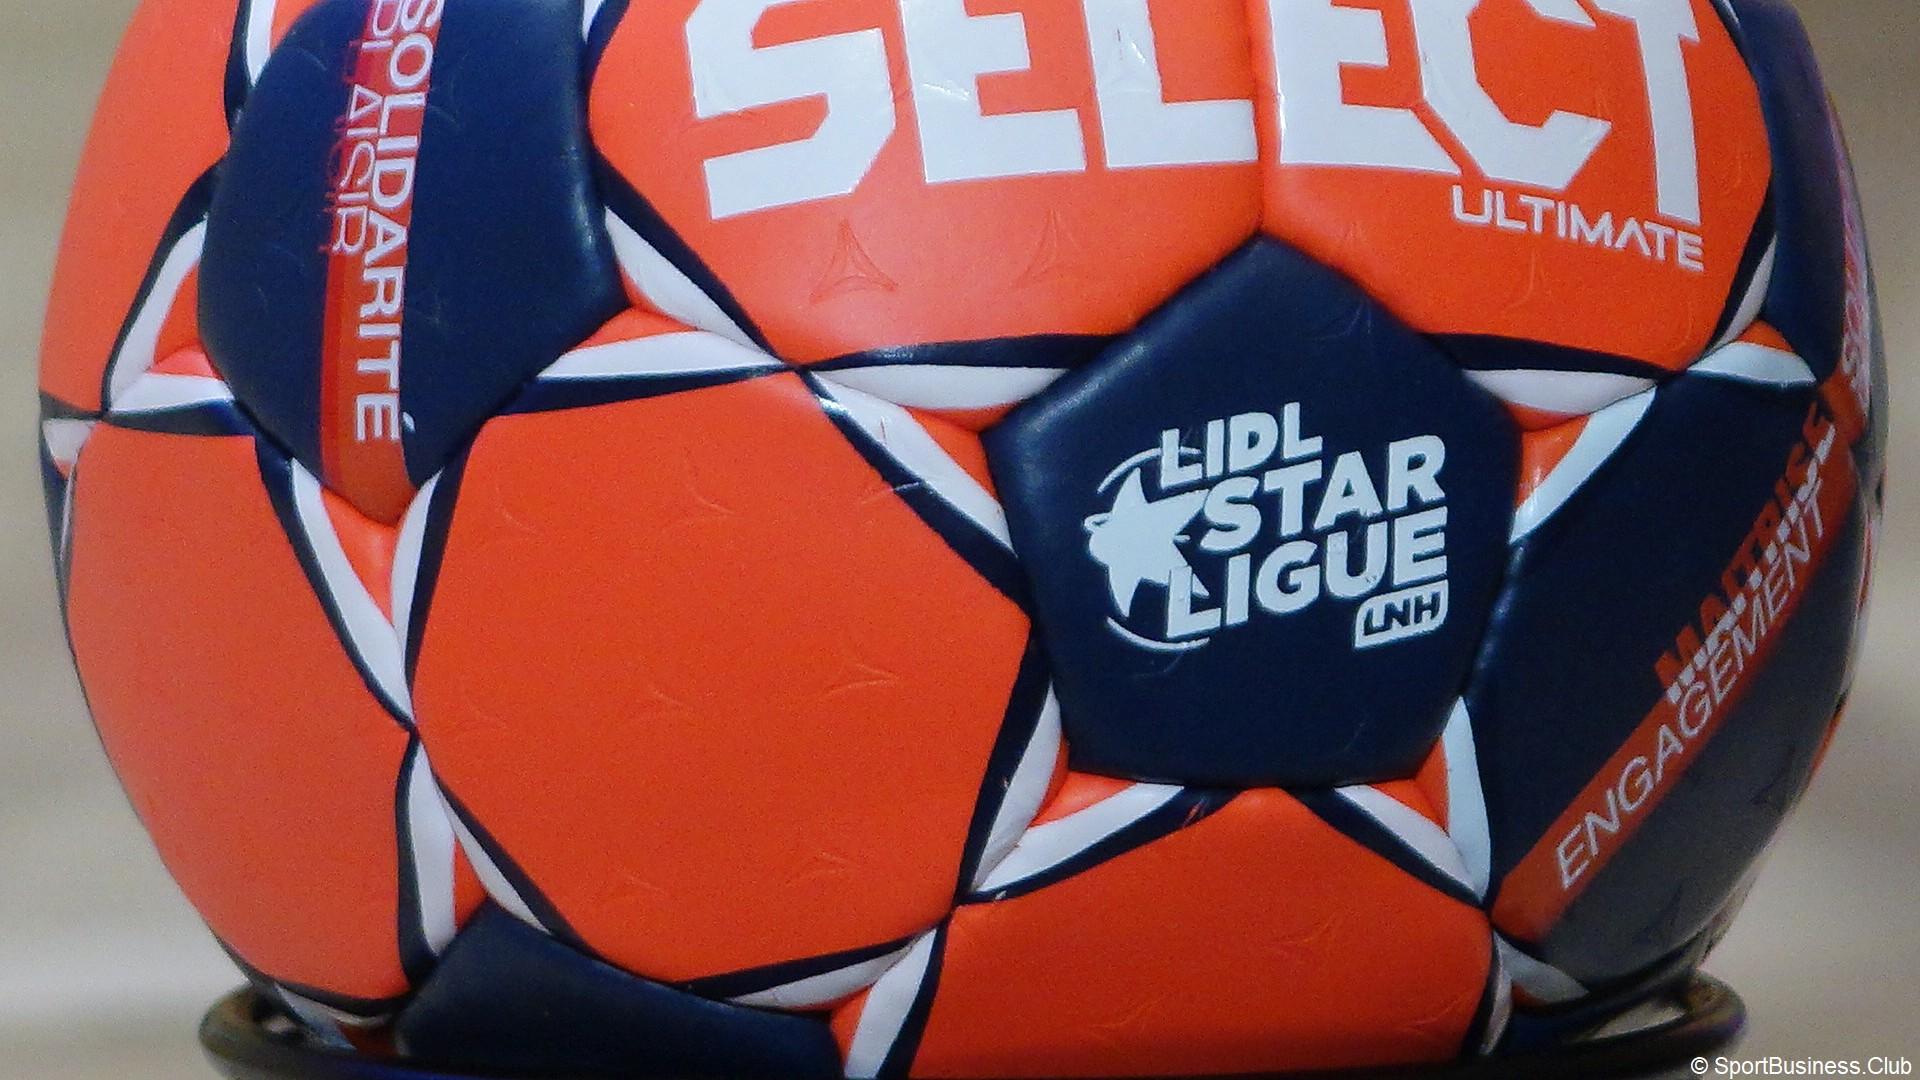 Lidl Starligue (2) Ballon